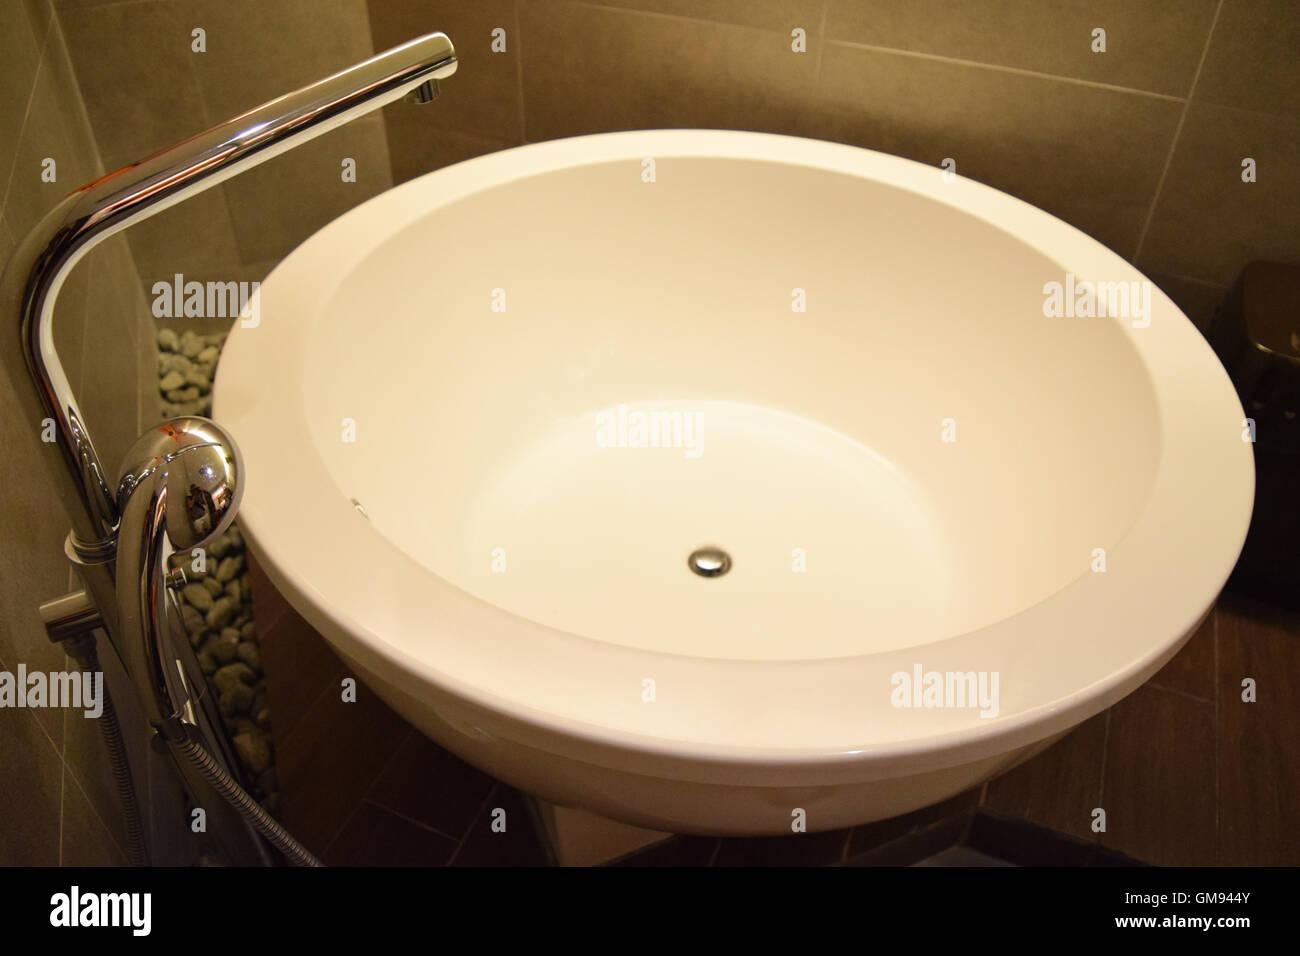 Hot Tub Bath Room Stock Photos & Hot Tub Bath Room Stock Images - Alamy